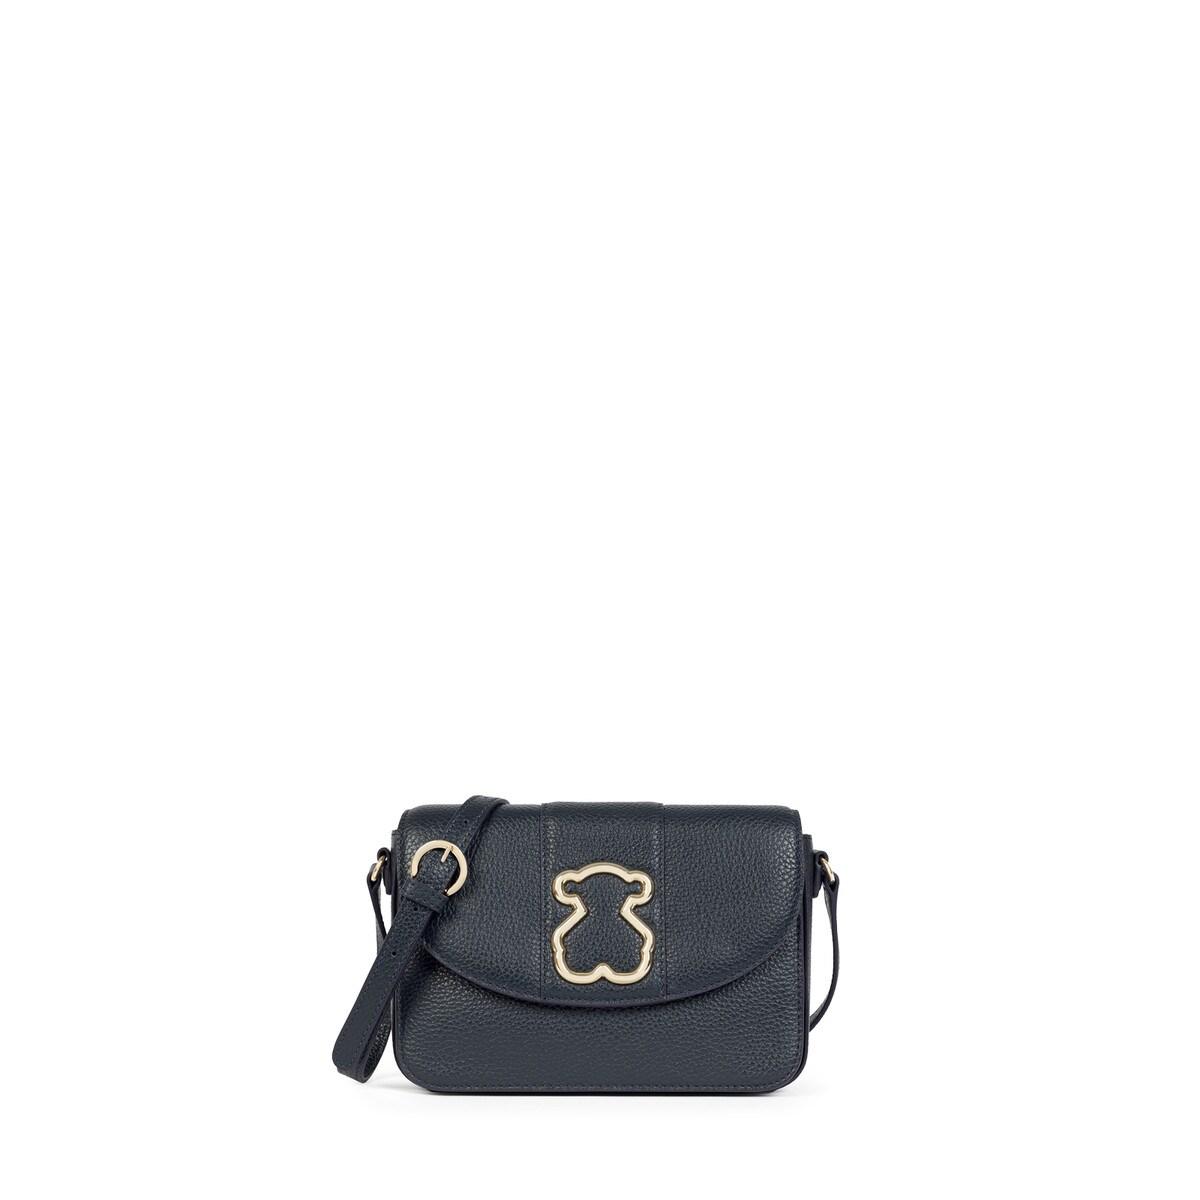 e8c43620f Small navy colored Leather Alfa Crossbody bag - Tous Site GB